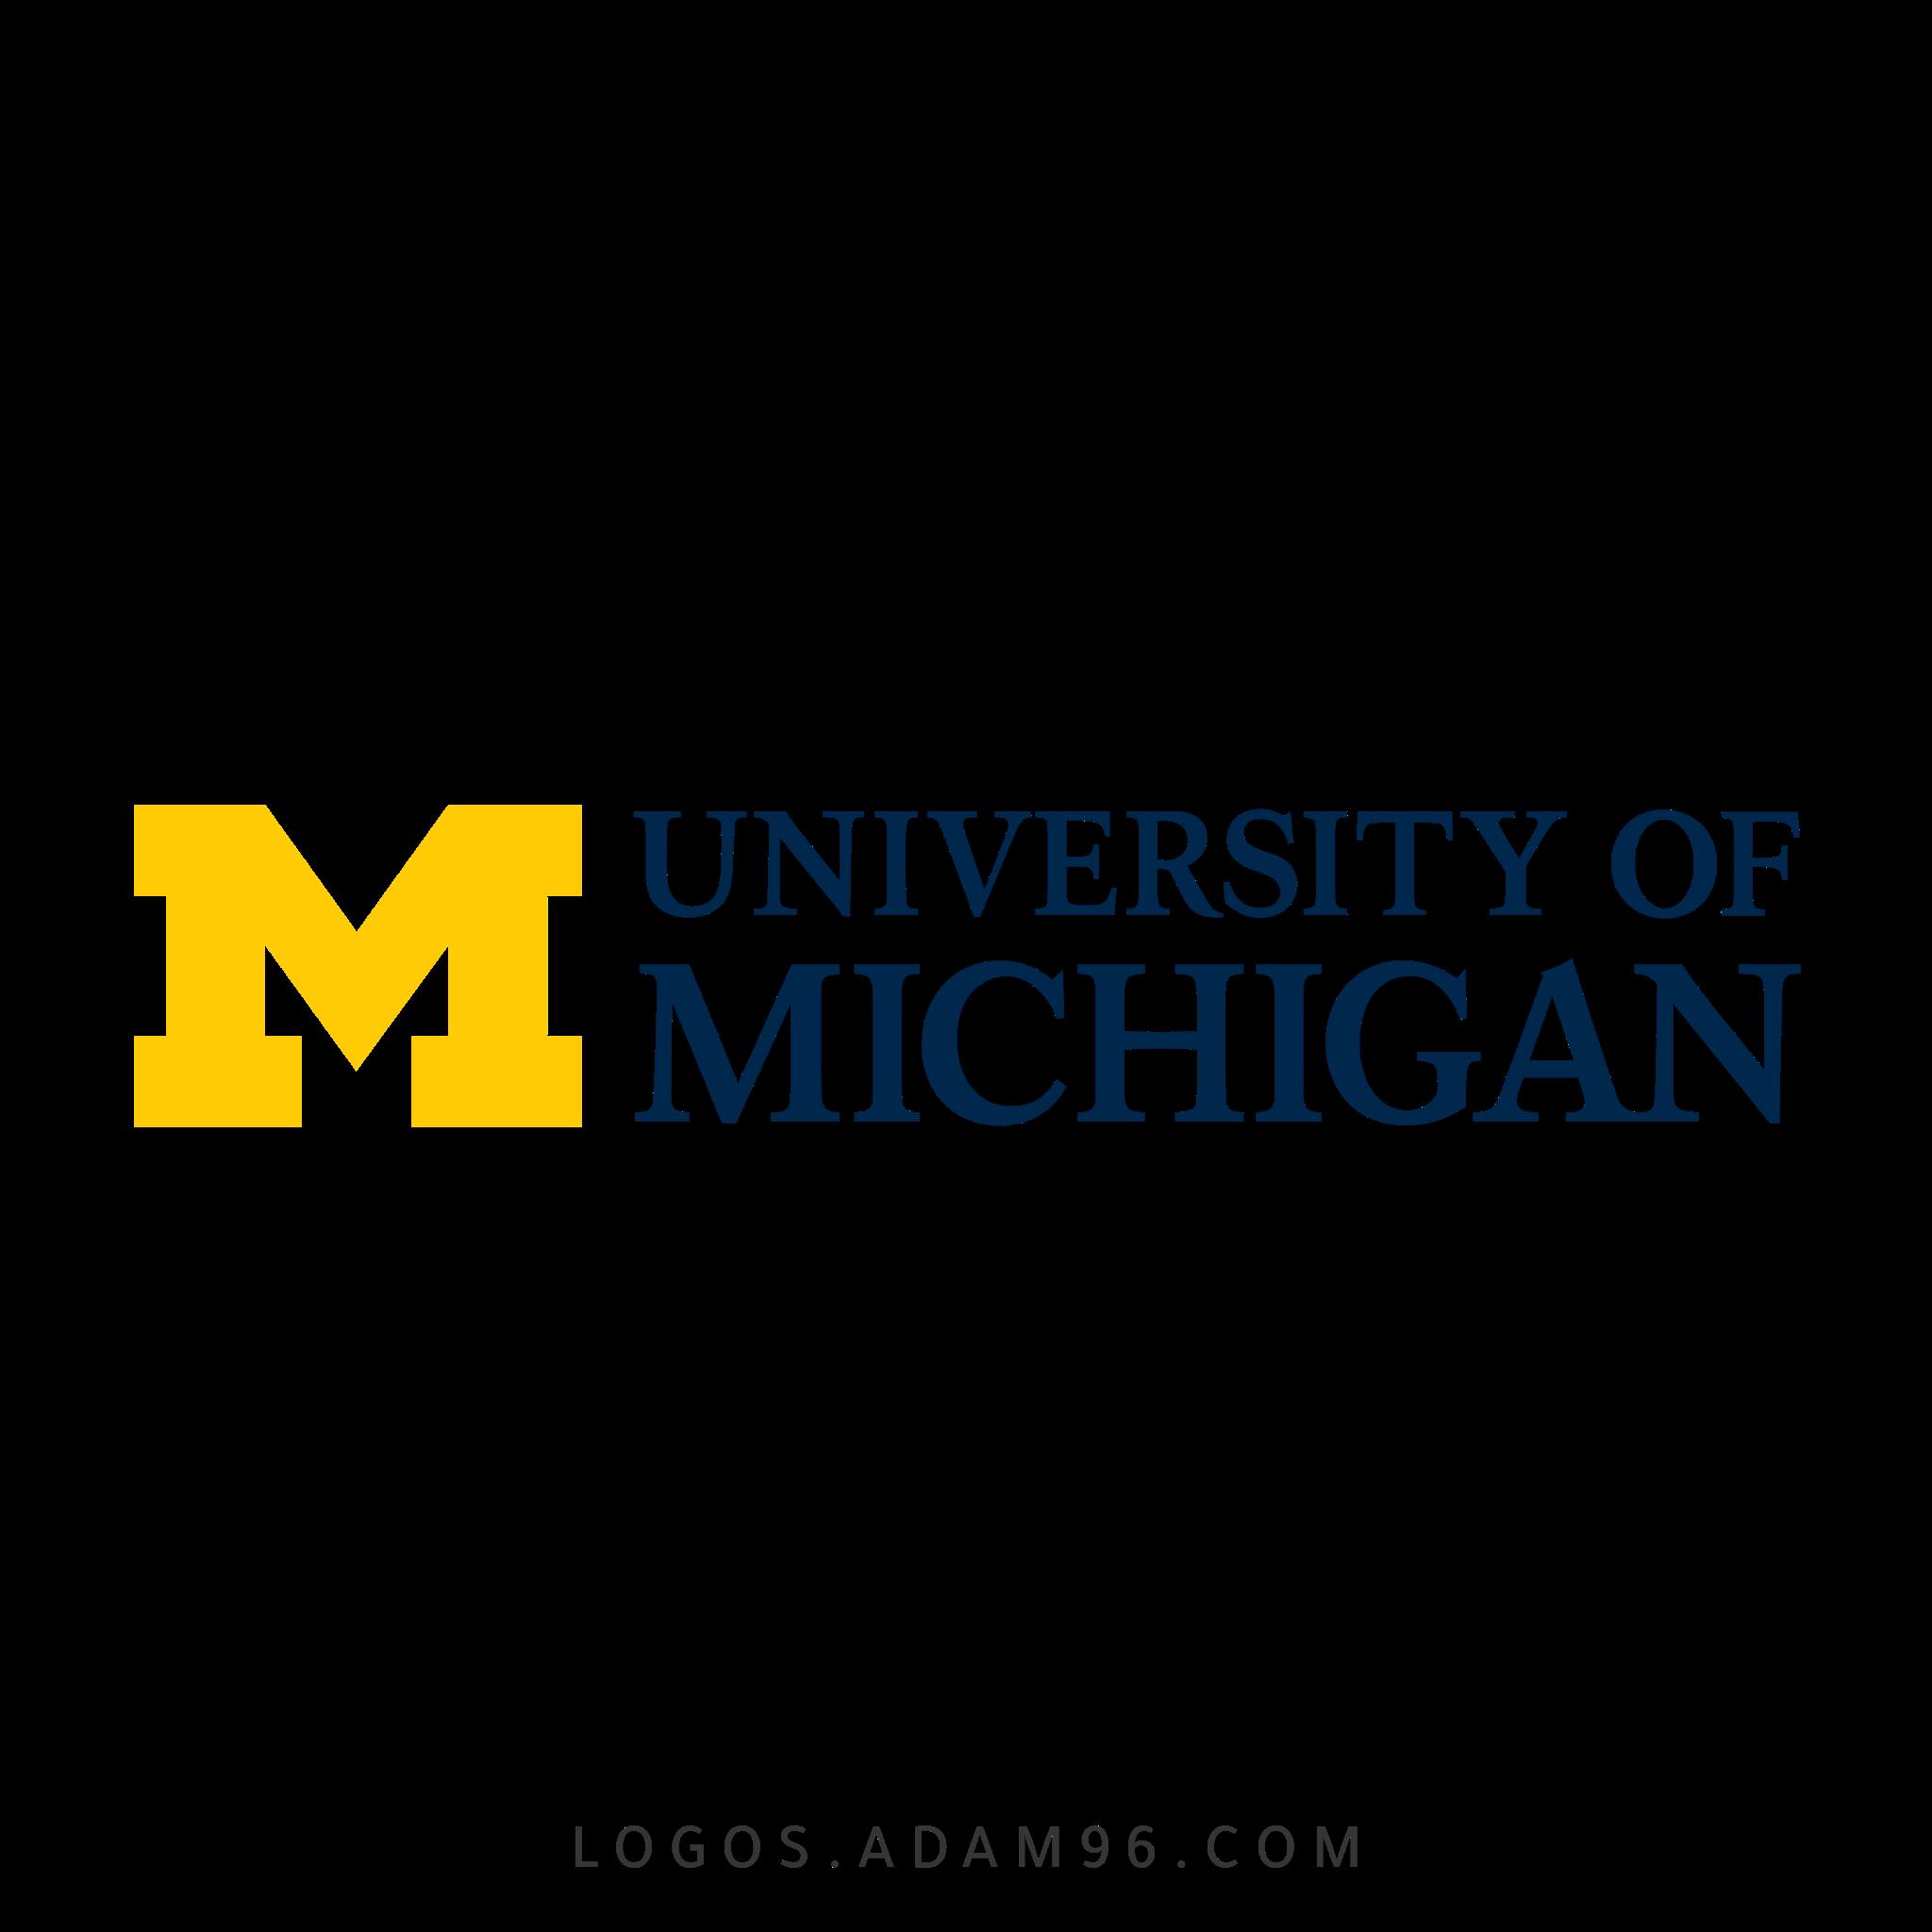 تحميل شعار جامعة ميشيغان لوجو شفاف Logo University of Michigan PNG